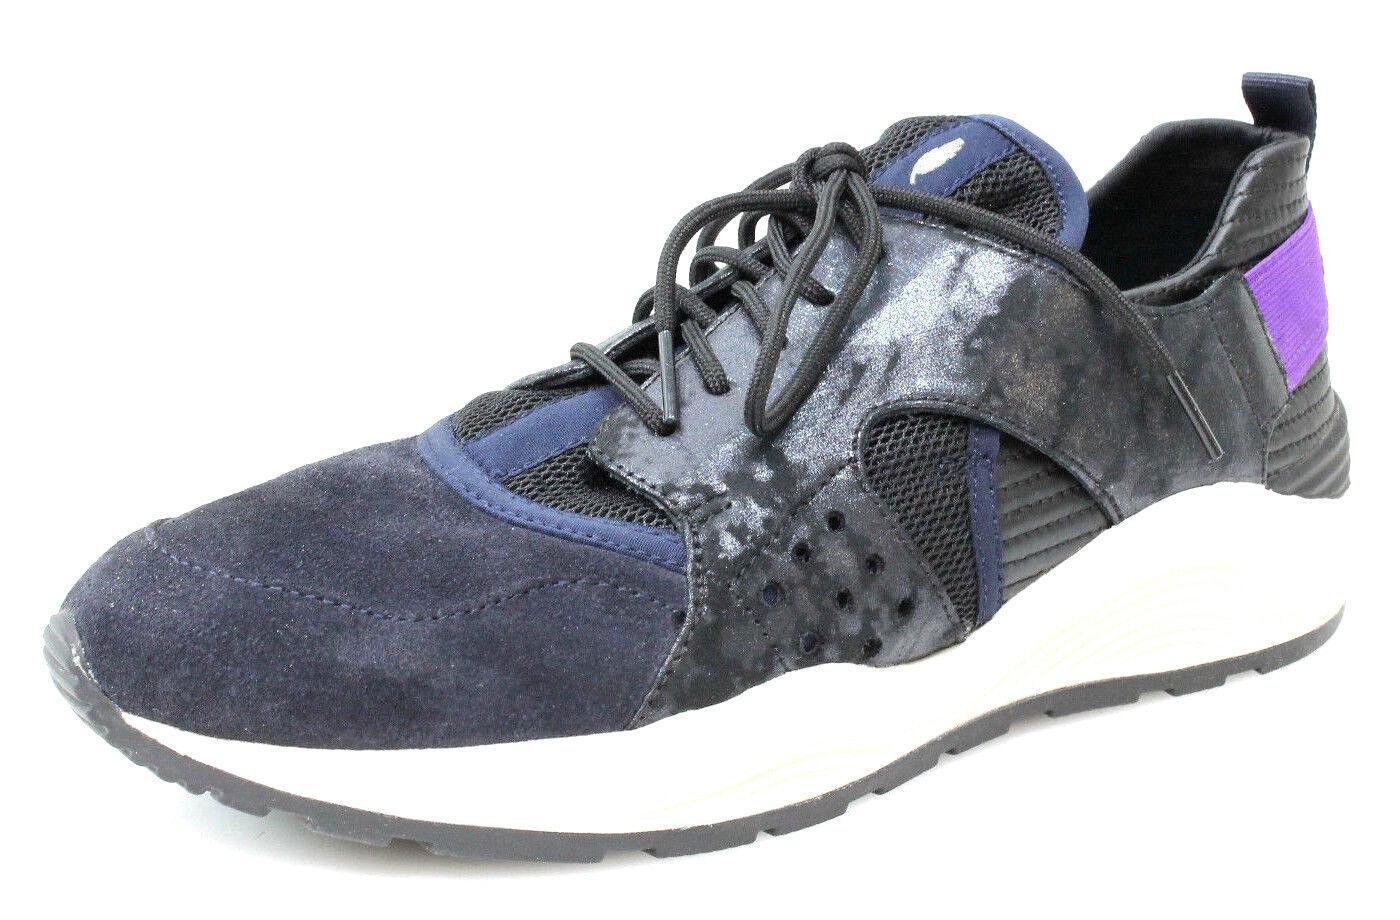 Geox Damen Sneakers Omaya Plus B Leder/Mesh Schwarz Turnschuhe Gr. 41 Neu